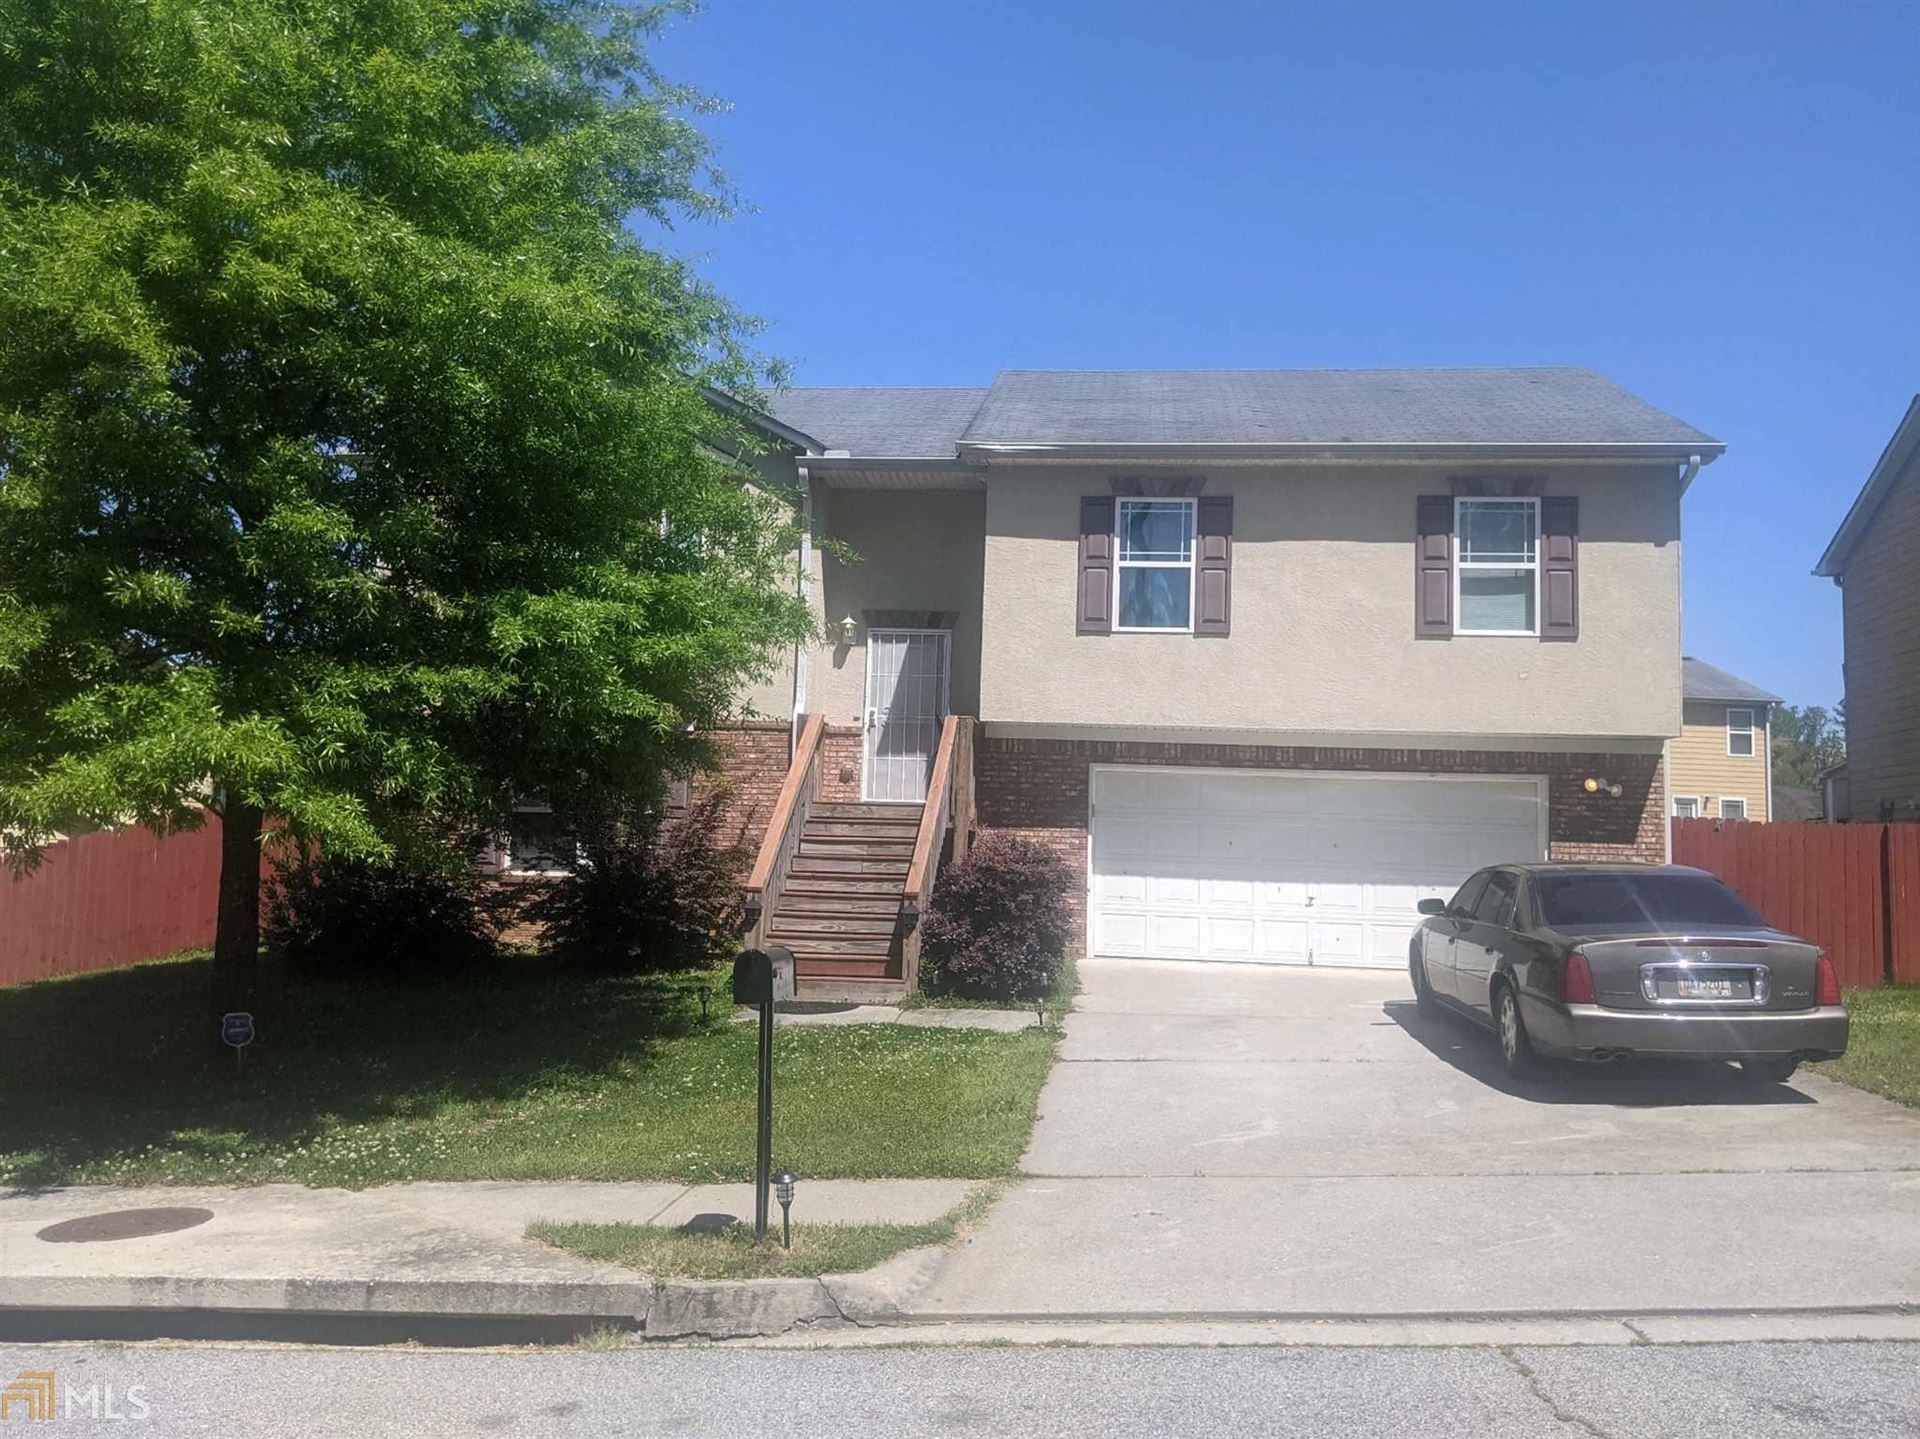 3901 Alderwoods Dr, Jonesboro, GA 30236 - #: 8950655